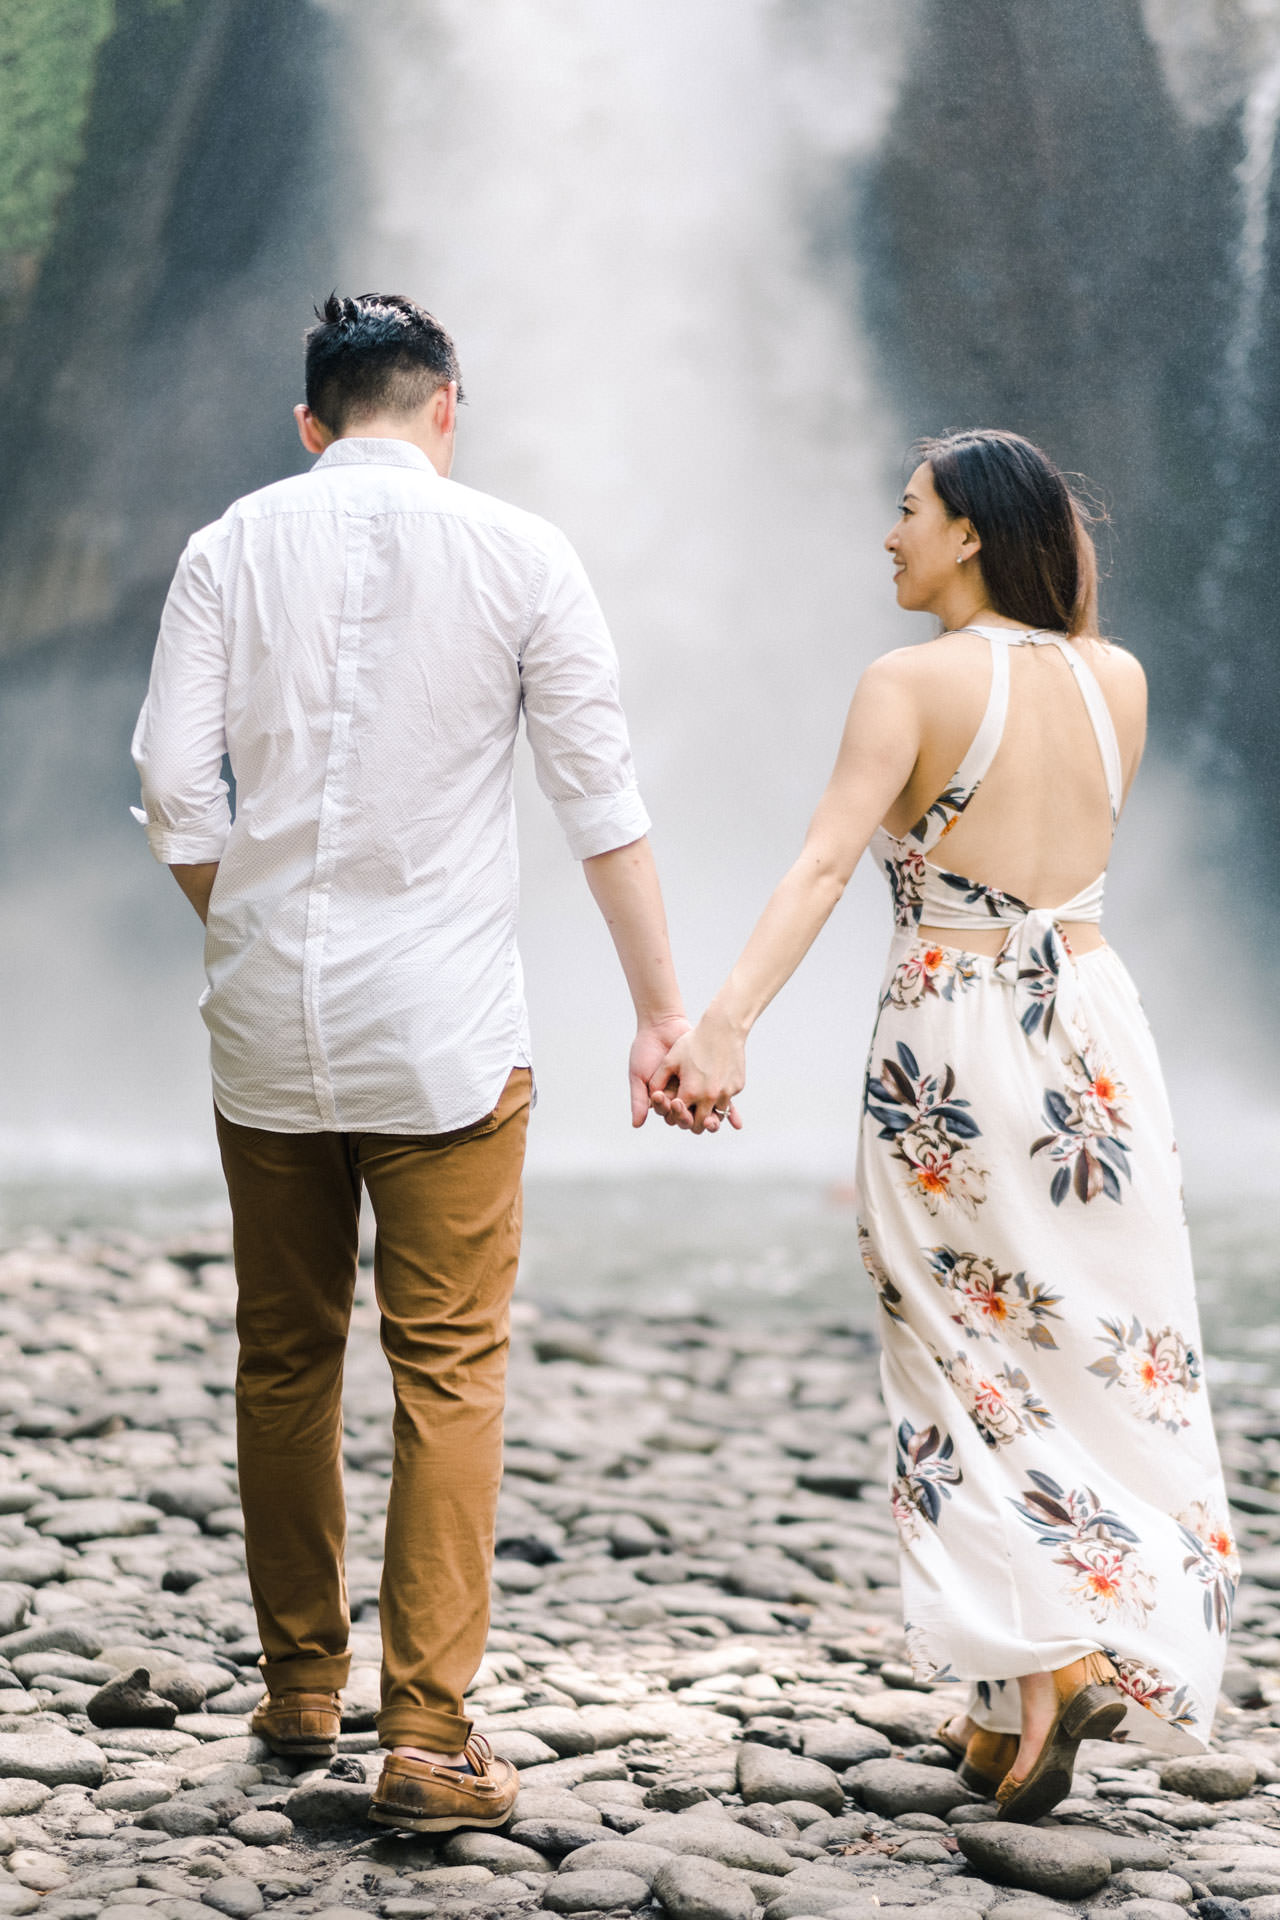 Adventurous Waterfall Surprise Proposal - Bali Vacation Proposal Ideas 21